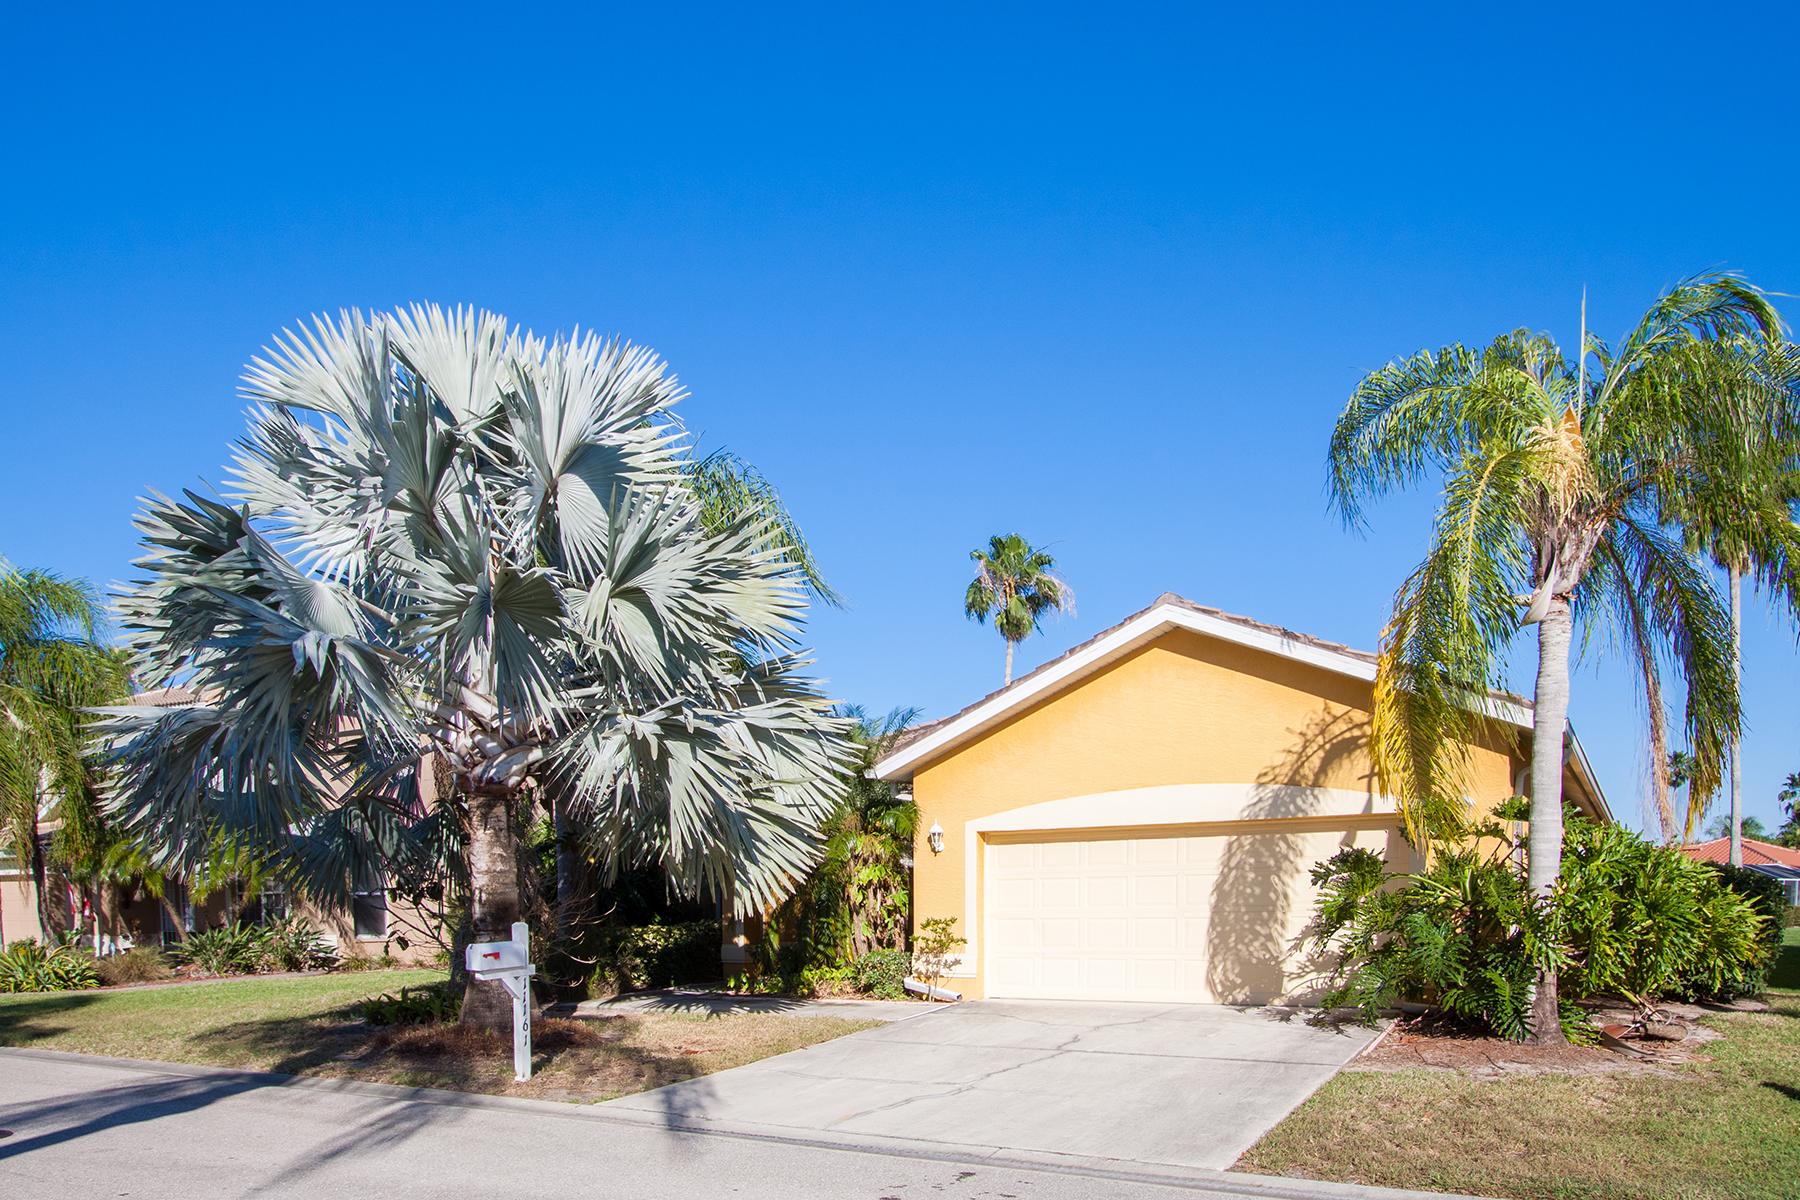 獨棟家庭住宅 為 出售 在 GATEWAY - SILVER LAKES 11161 Lakeland Cir, Fort Myers, 佛羅里達州, 33913 美國